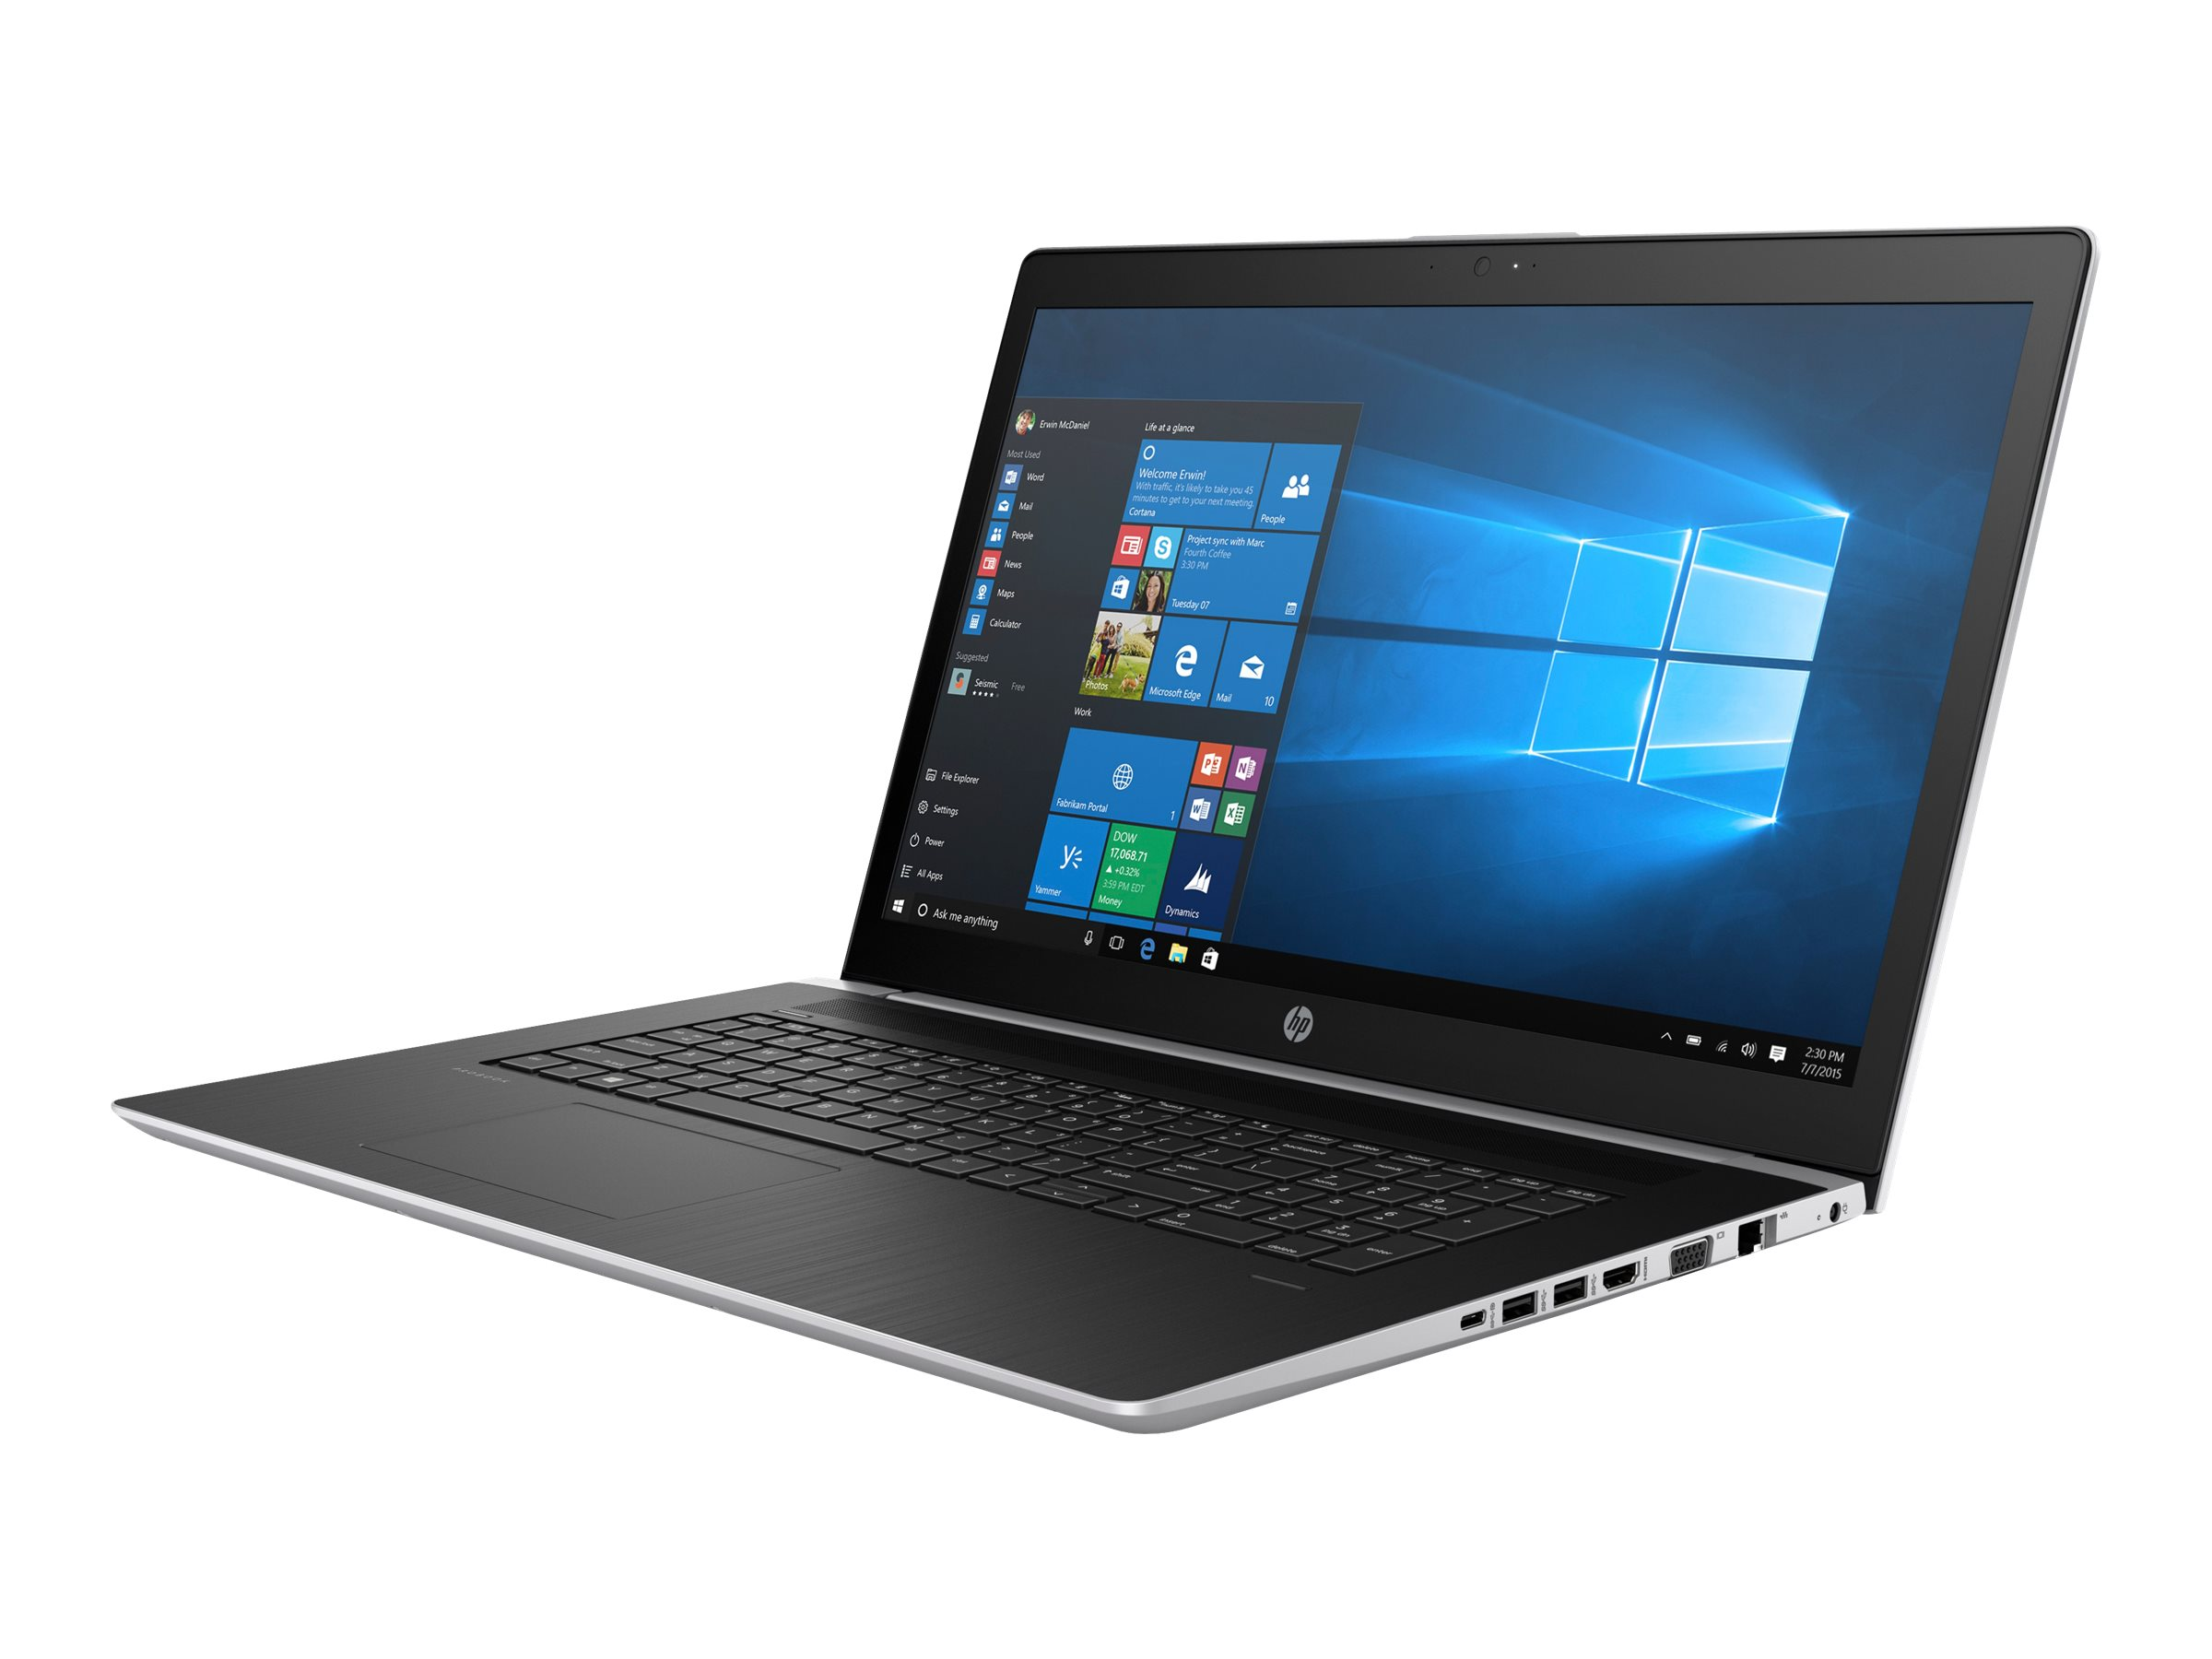 "HP ProBook 470 G5 - Core i7 8550U / 1.8 GHz - Win 10 Pro 64-Bit - 8 GB RAM - 256 GB SSD NVMe, HP Value - 43.9 cm (17.3"")"